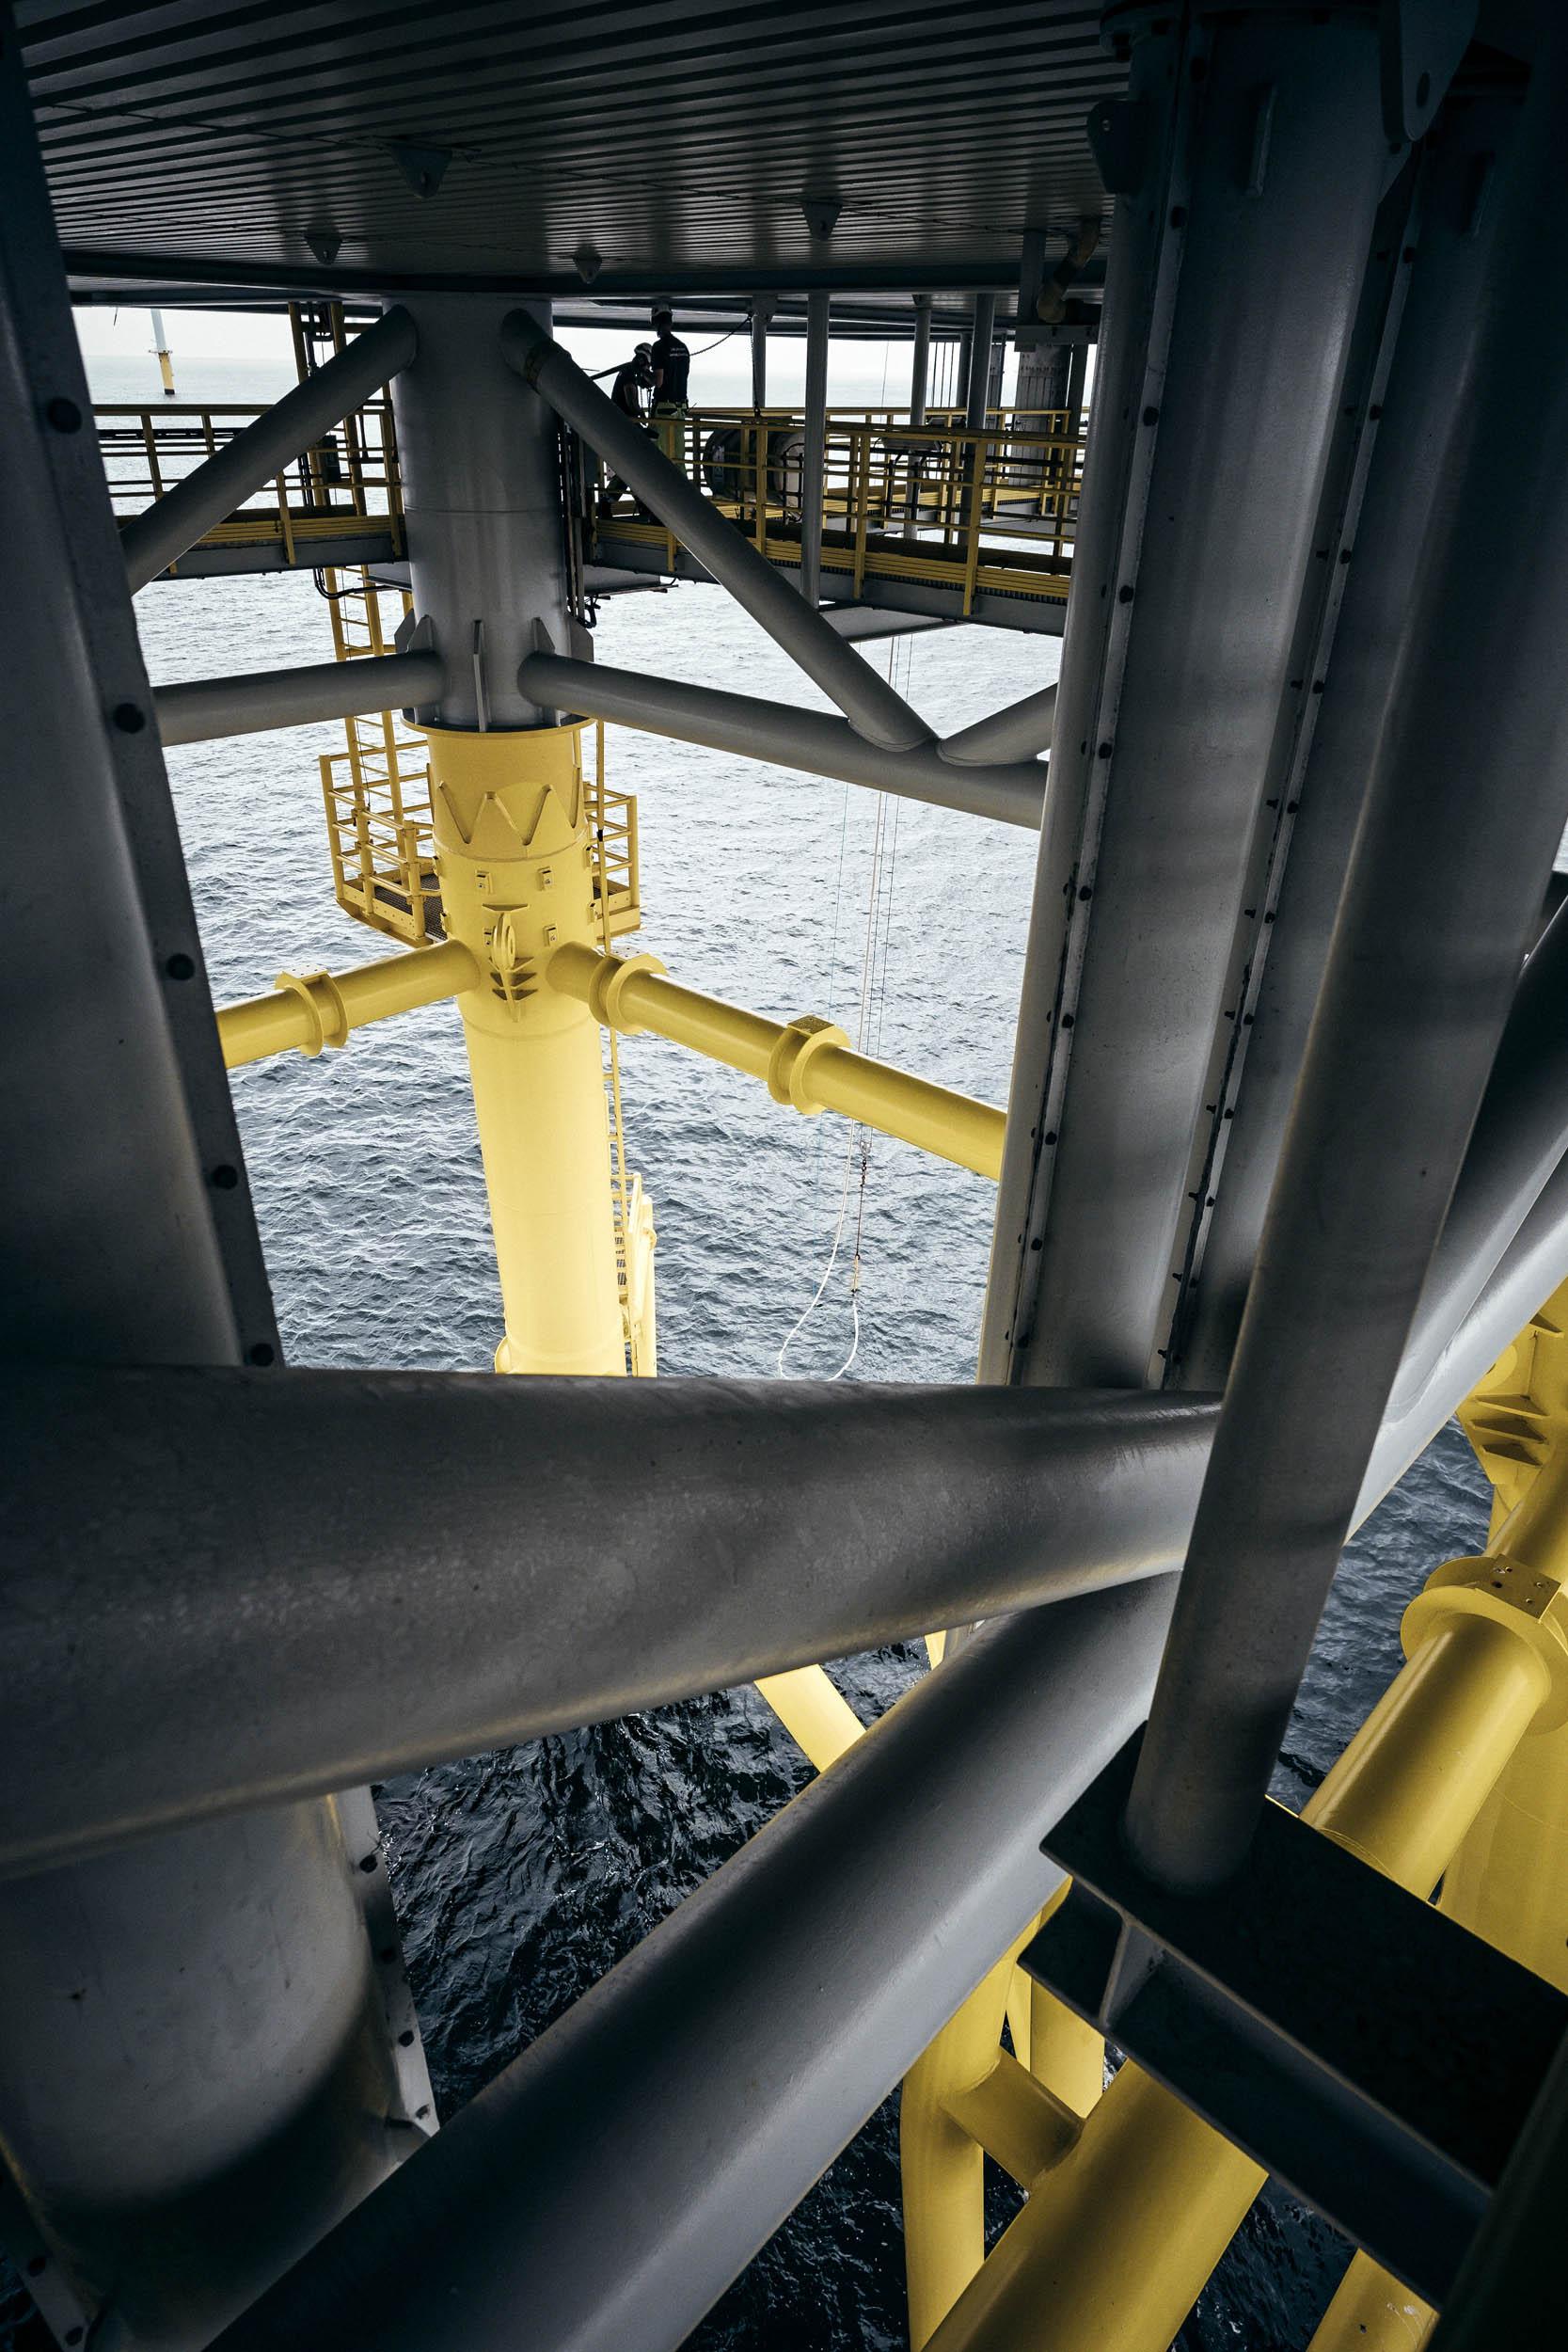 2019-SeifertUebler-EWE-offshore-windpower-026.jpg